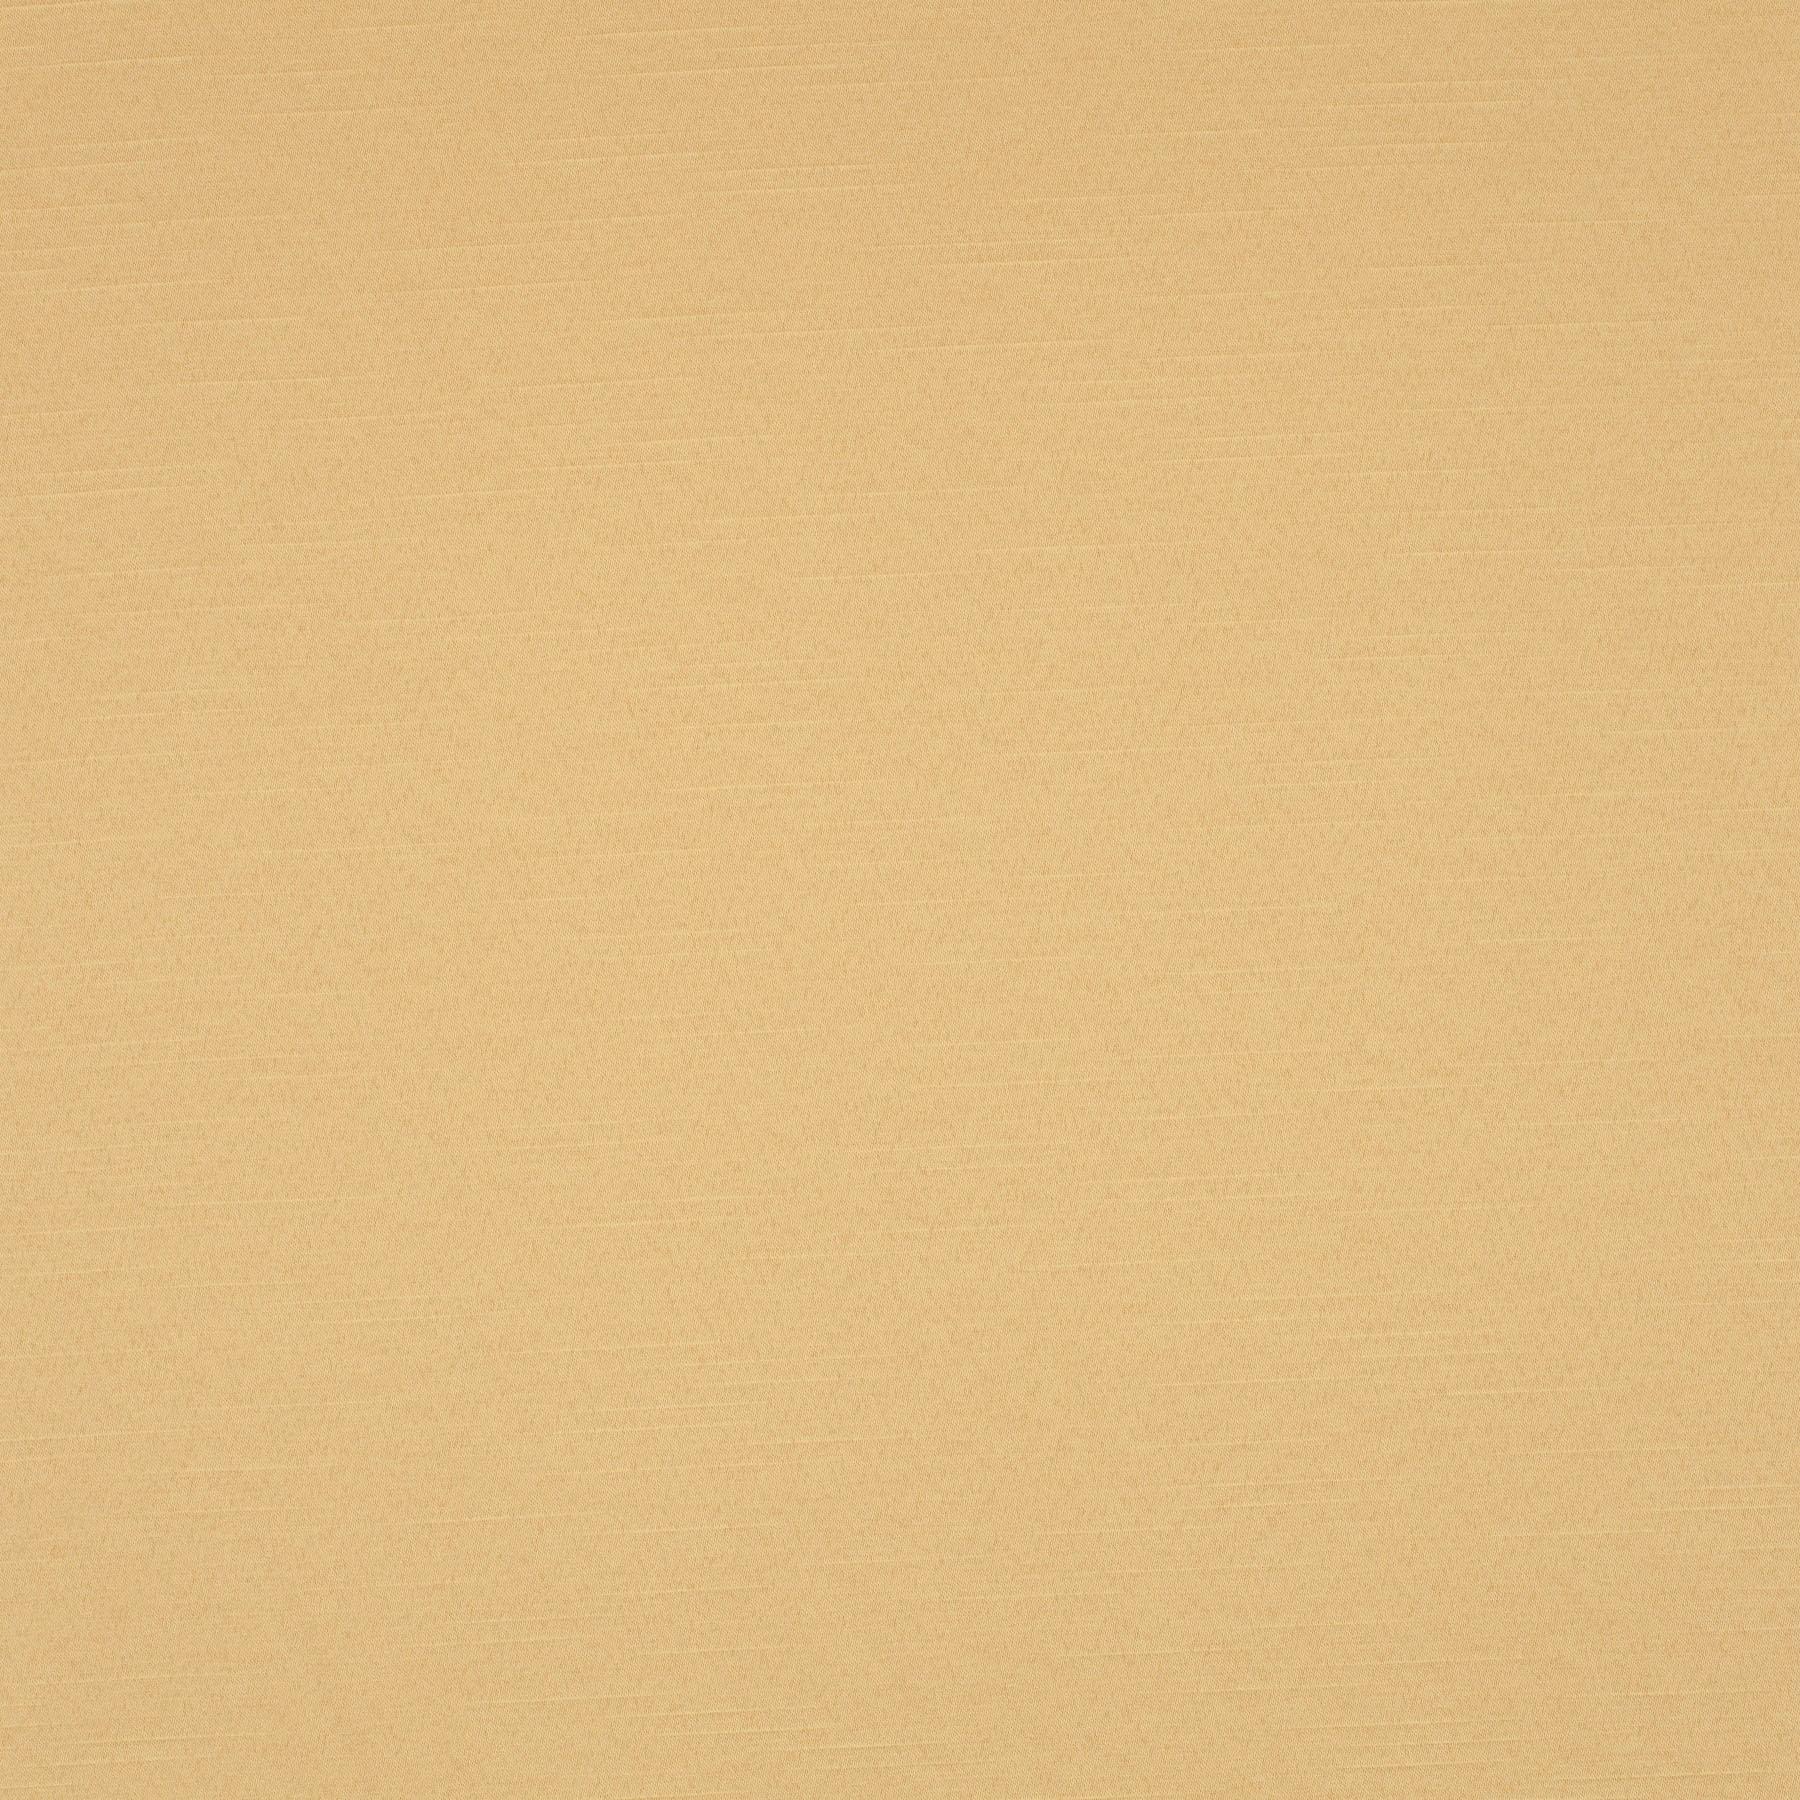 decoration fabric hanibal 1 6549 347 jab anstoetz fabrics. Black Bedroom Furniture Sets. Home Design Ideas